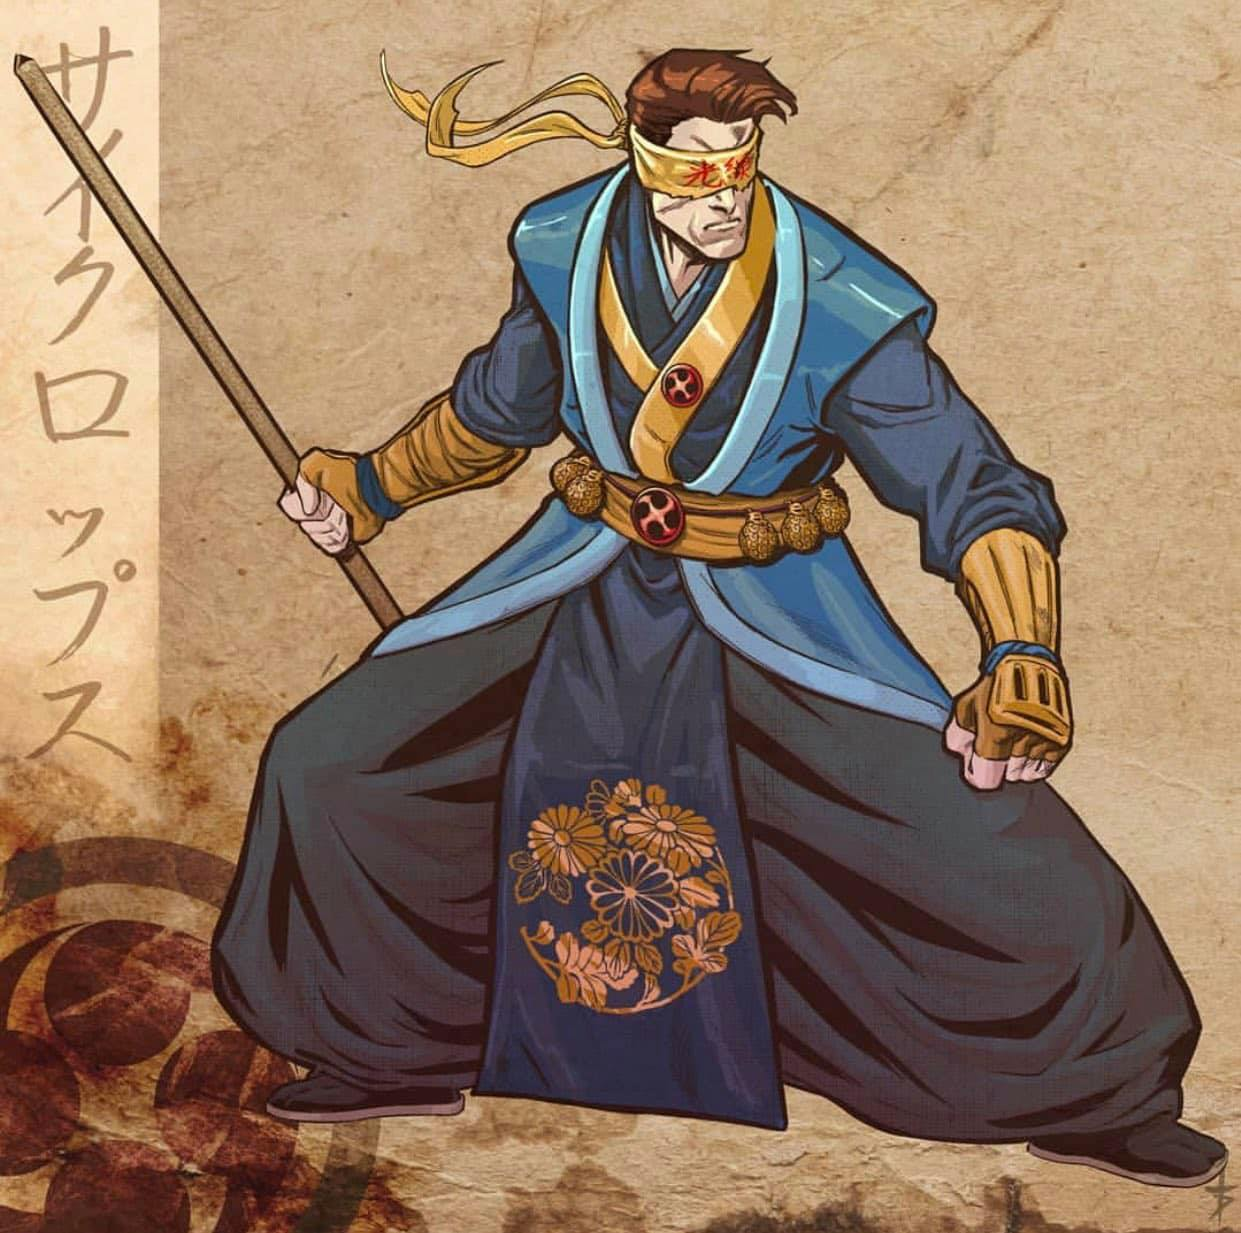 Cíclope Samurai